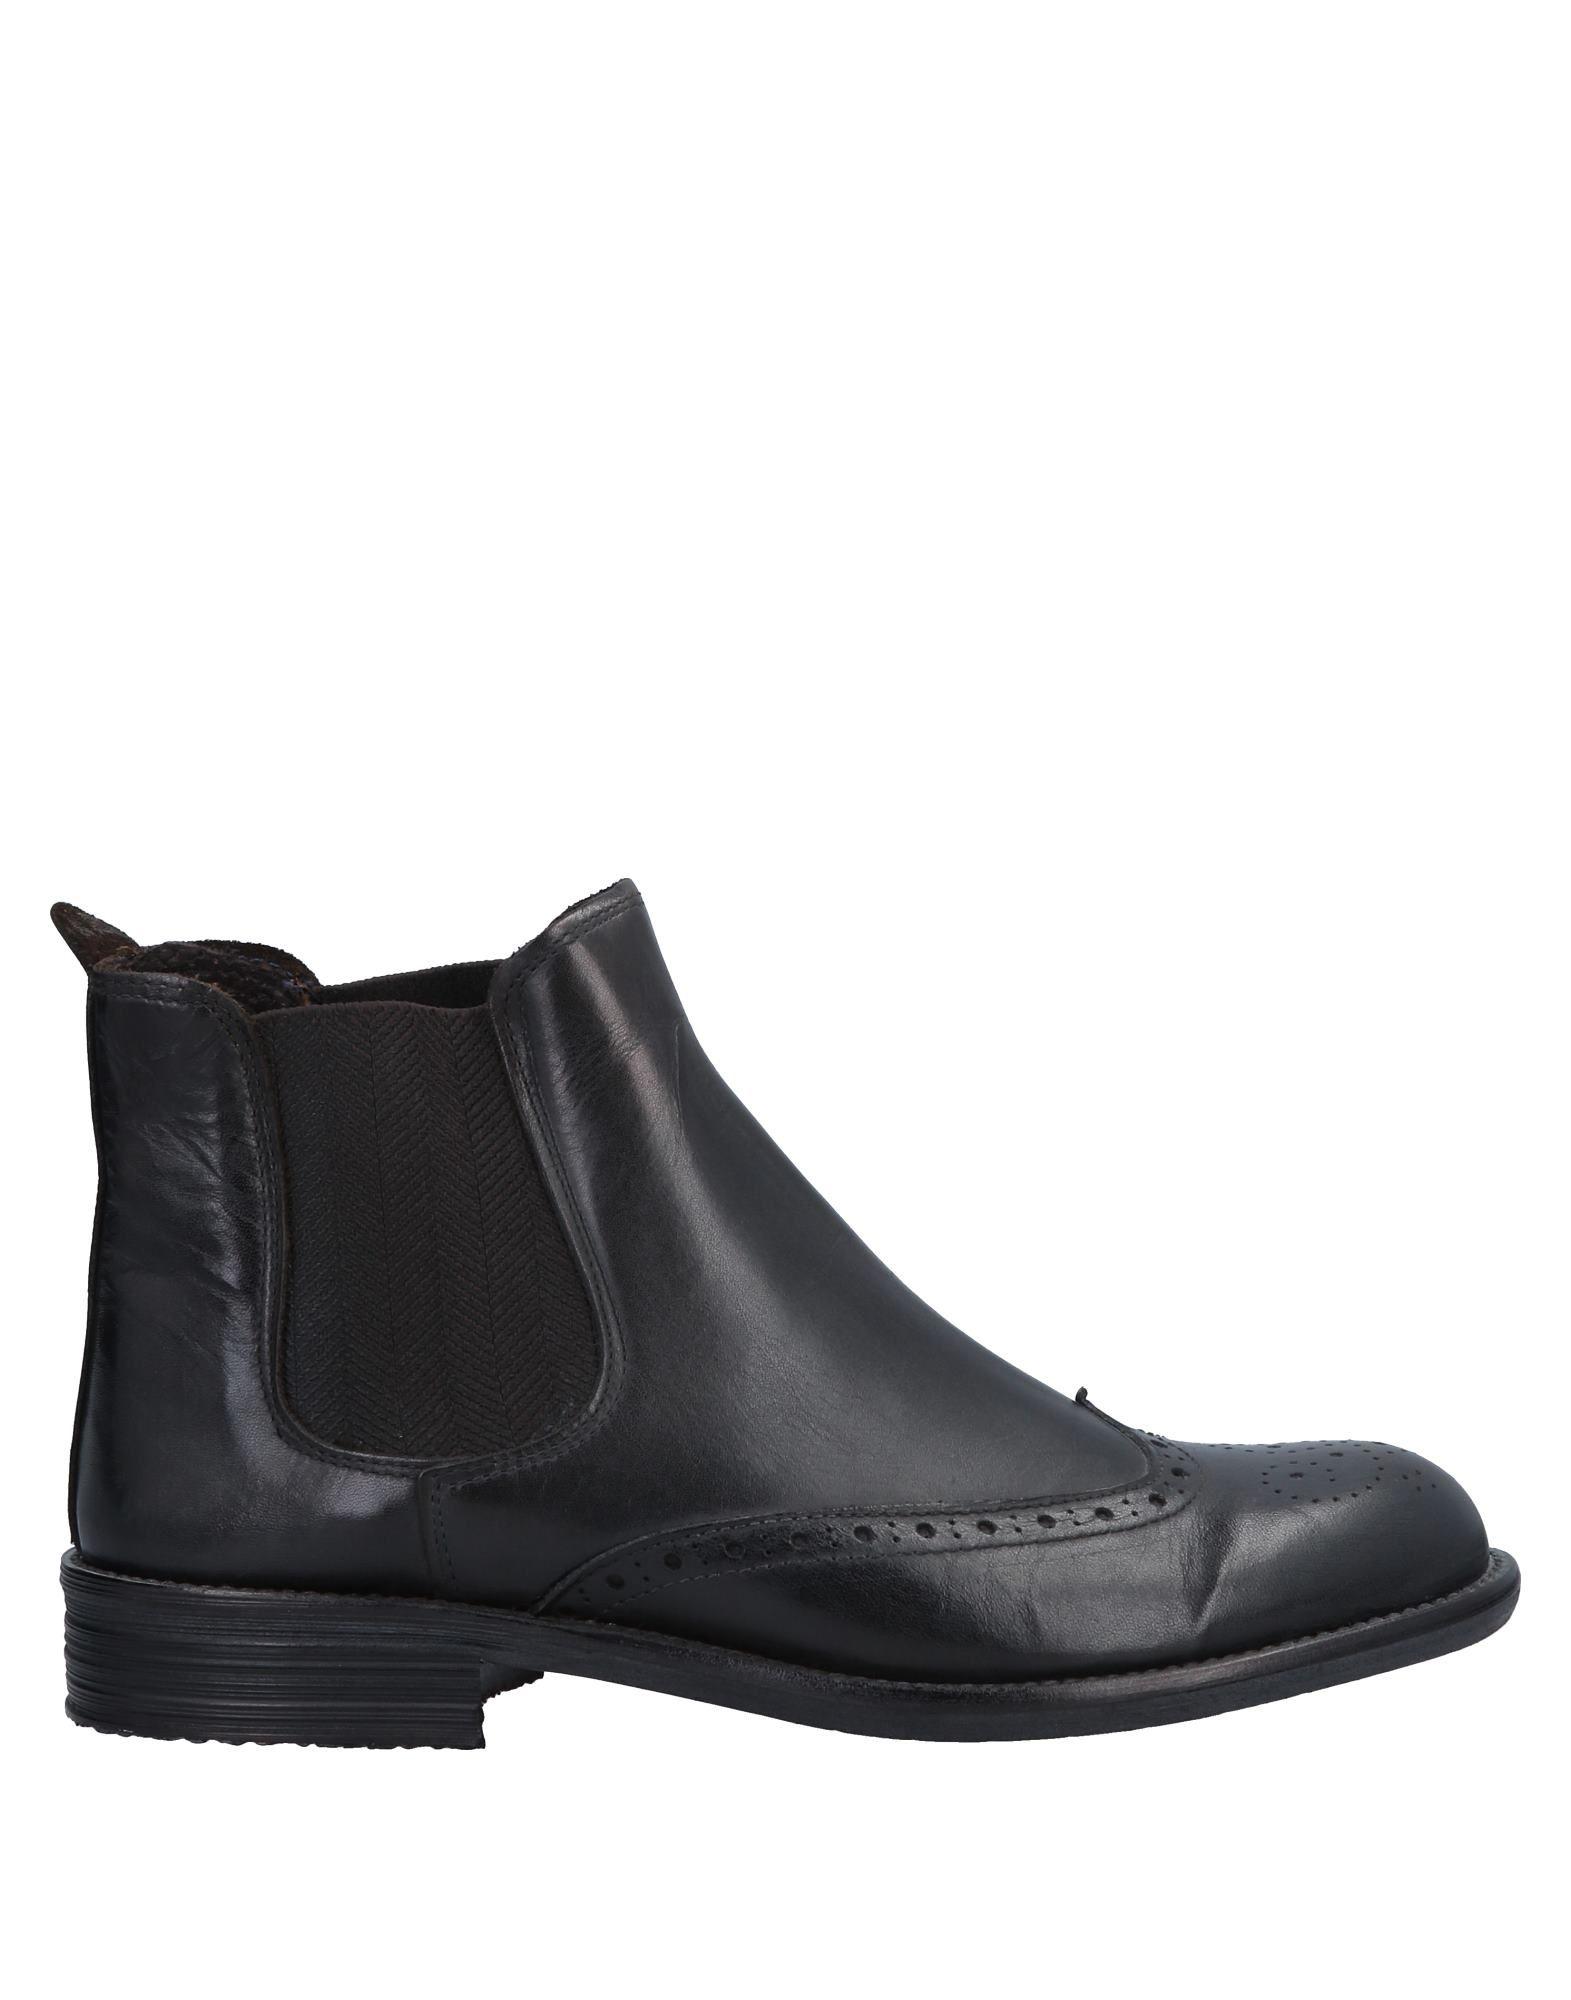 Mlc Italia Boots Boots - Men Mlc Italia Boots Boots online on  United Kingdom - 11568716KQ ee9bca